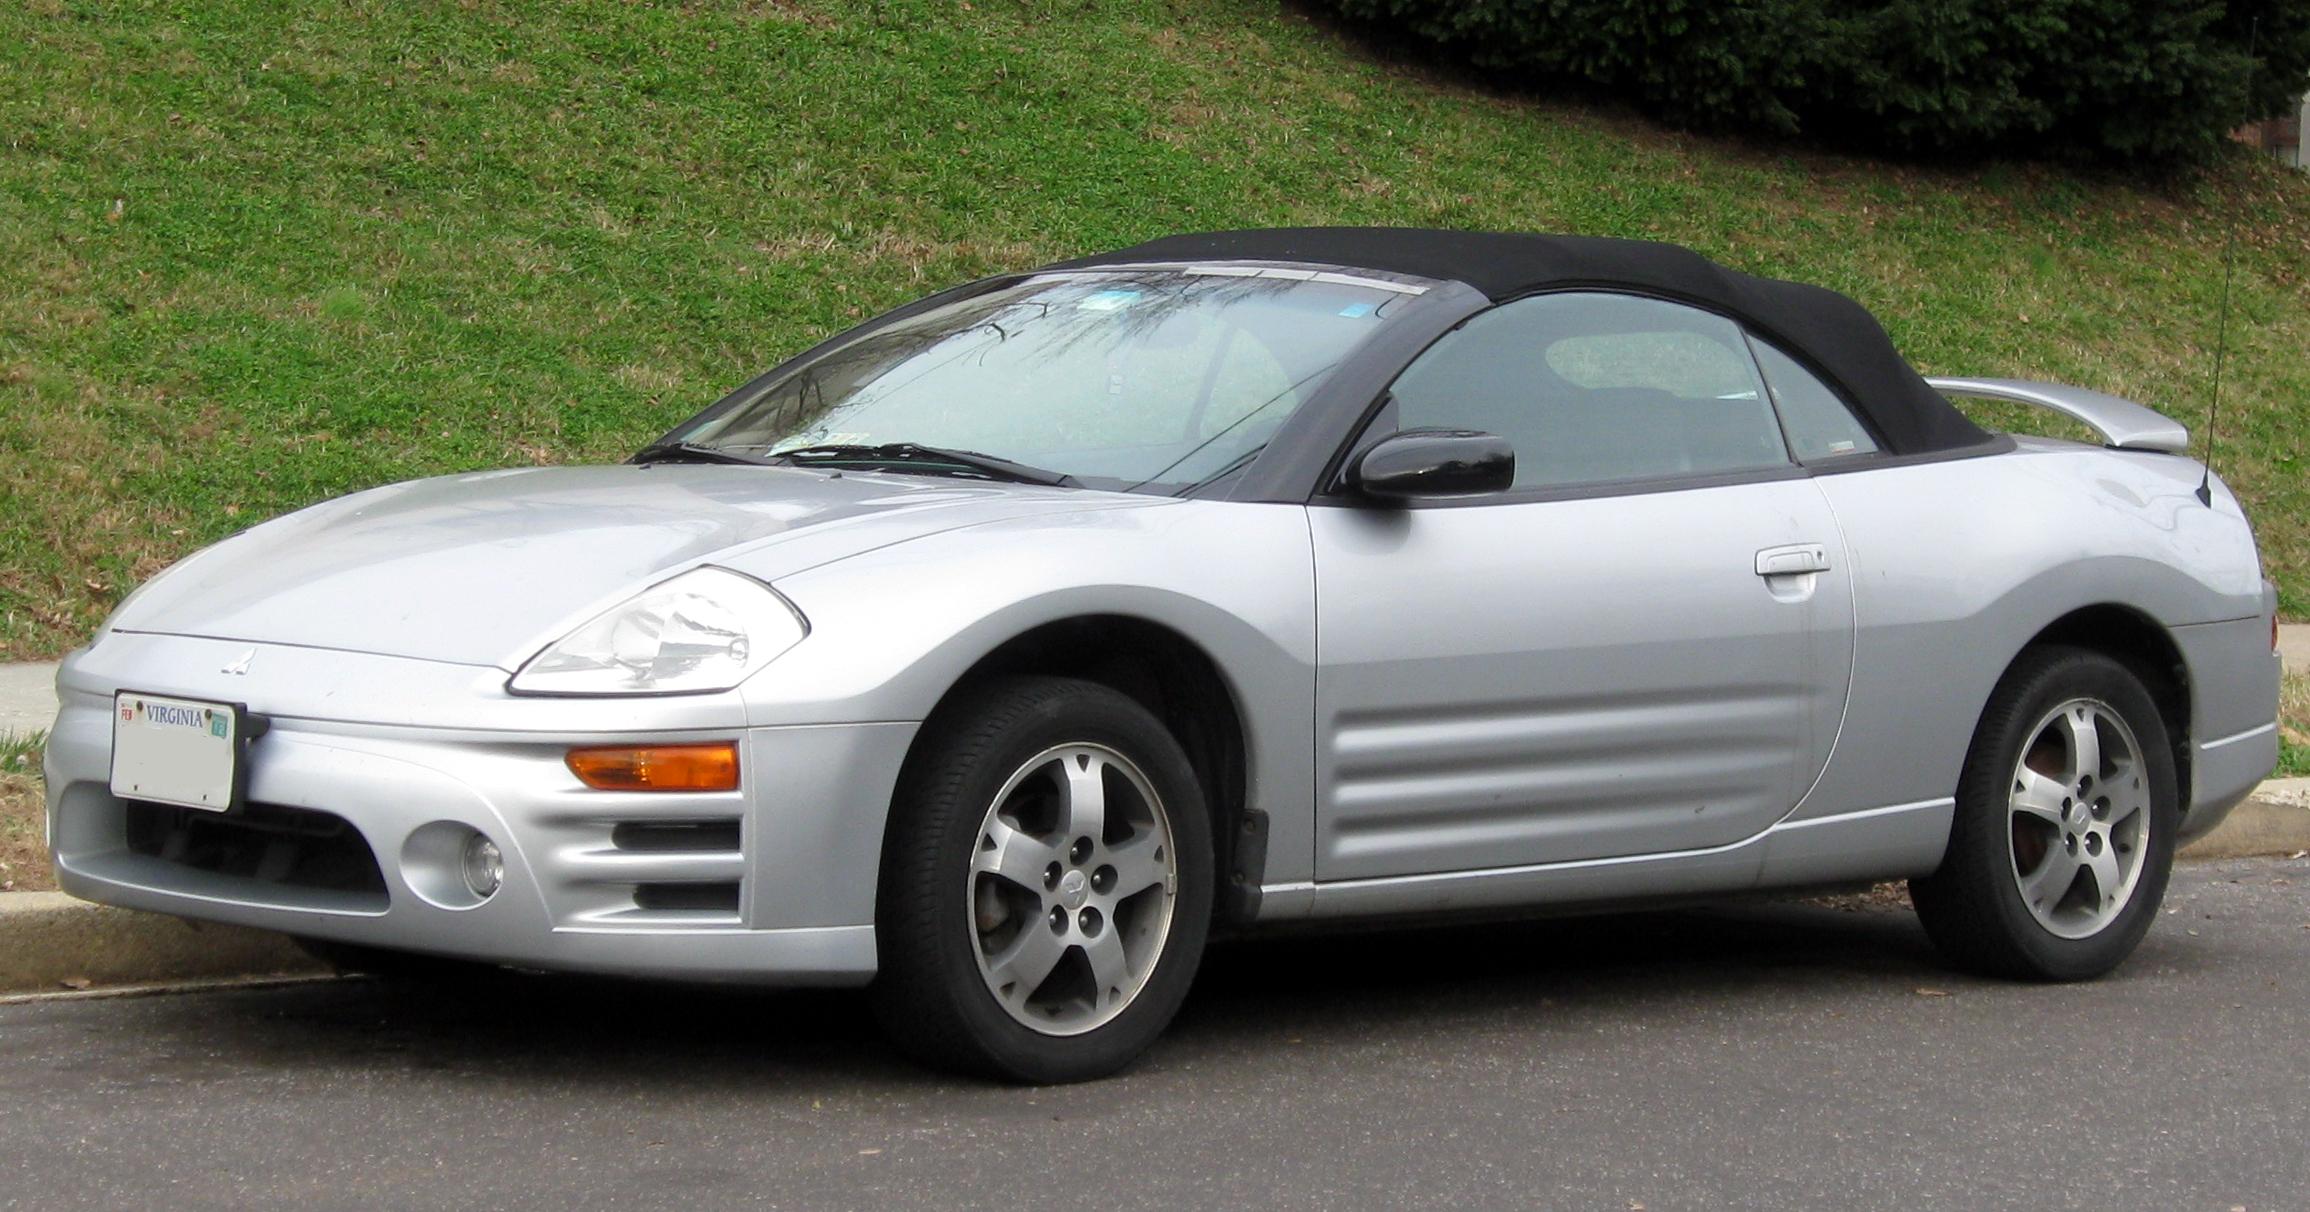 Mitsubishi Eclipse III 1999 - 2005 Cabriolet #5